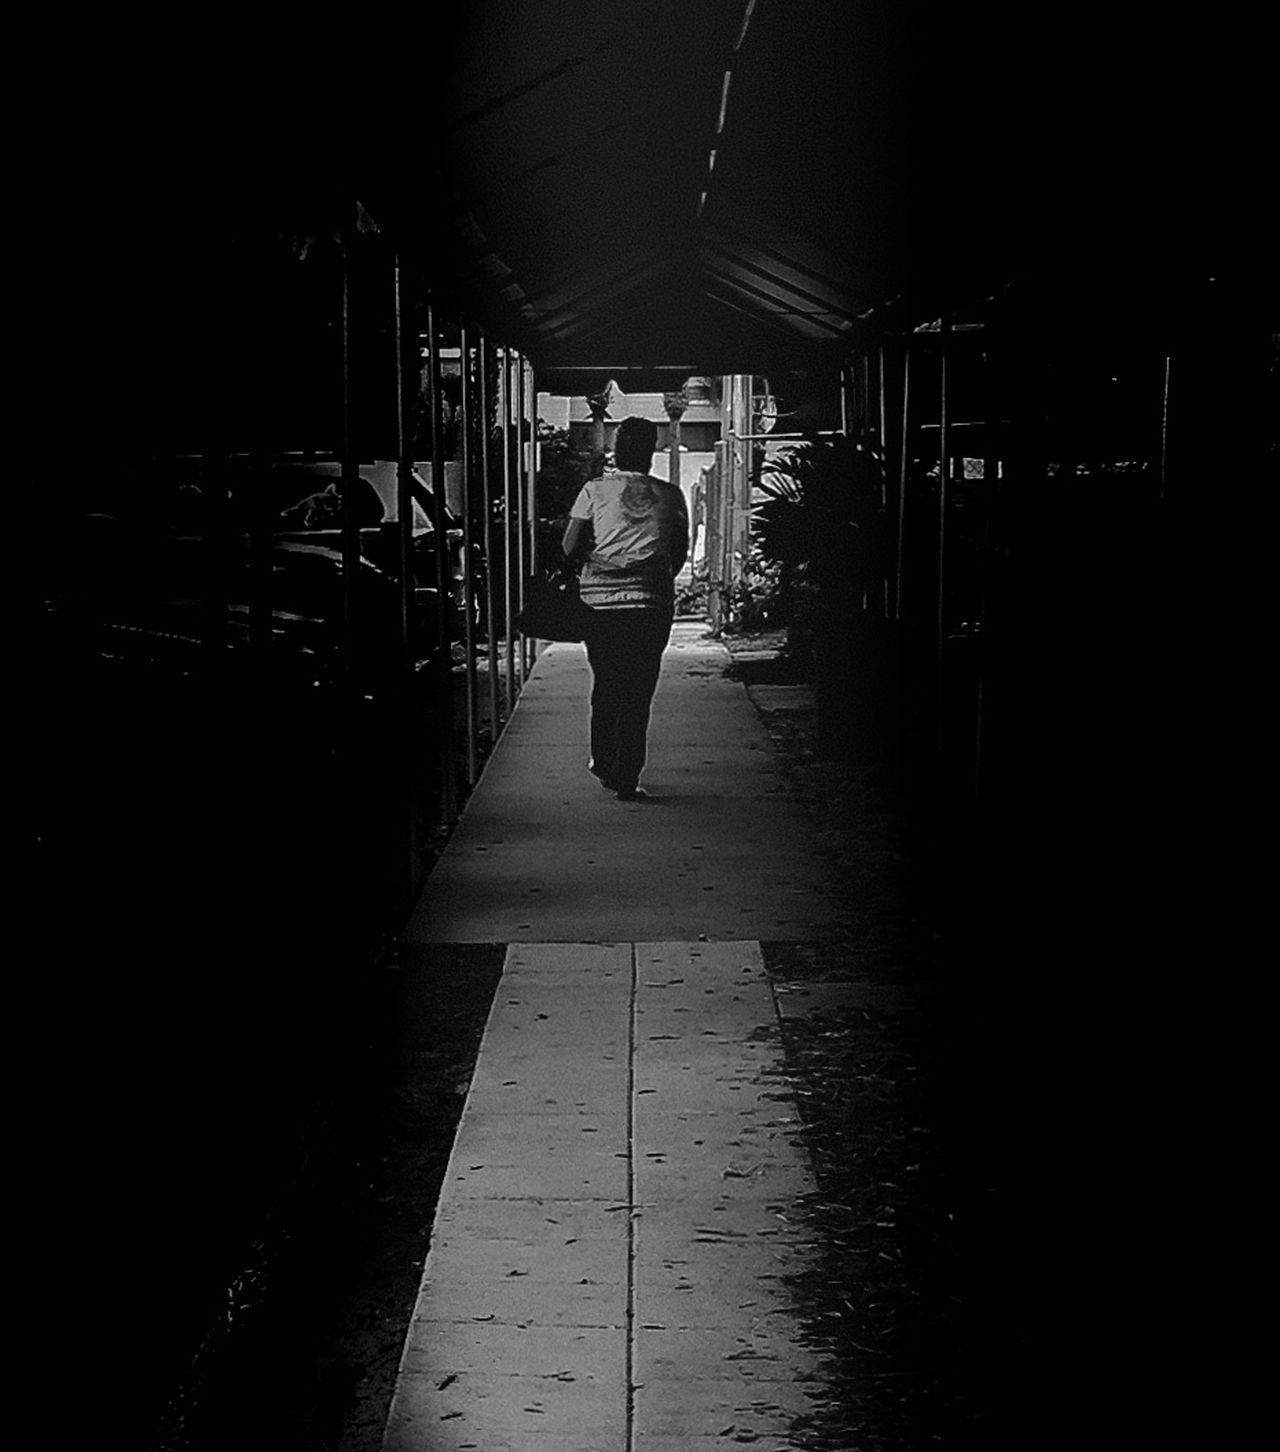 Black & White Blackandwhite Photography IPhone Photography IPhoneography Street Street Photography Streetphoto_bw Streetphotography